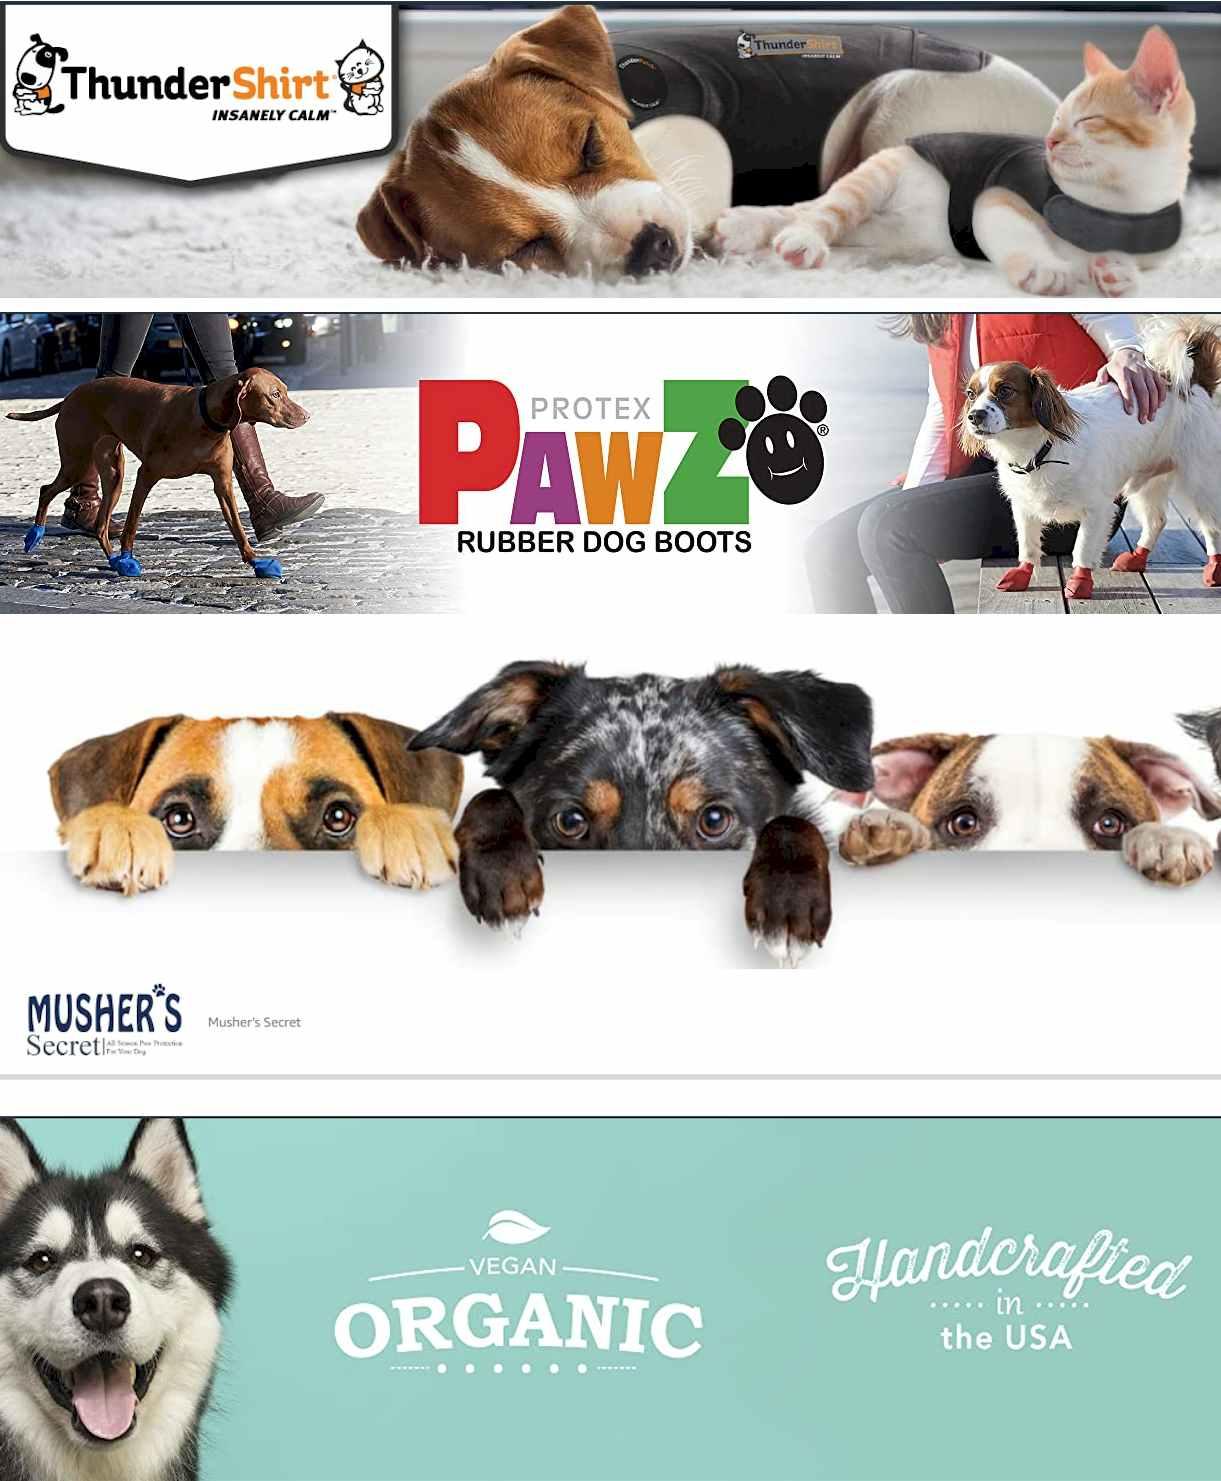 Thundershirt - Pawz - Mushers - Pets Accessories on Amazon -Pet Clothes & Accessories STORES Outward Hound Store - #Thundershirt - #Vivaglory - #Paws_Aboard - #QUMY - #Protex #PawZ - #Musher's Secret - #Rubie's - #Natural_Dog Company - #RUFFWEAR #pets #dog